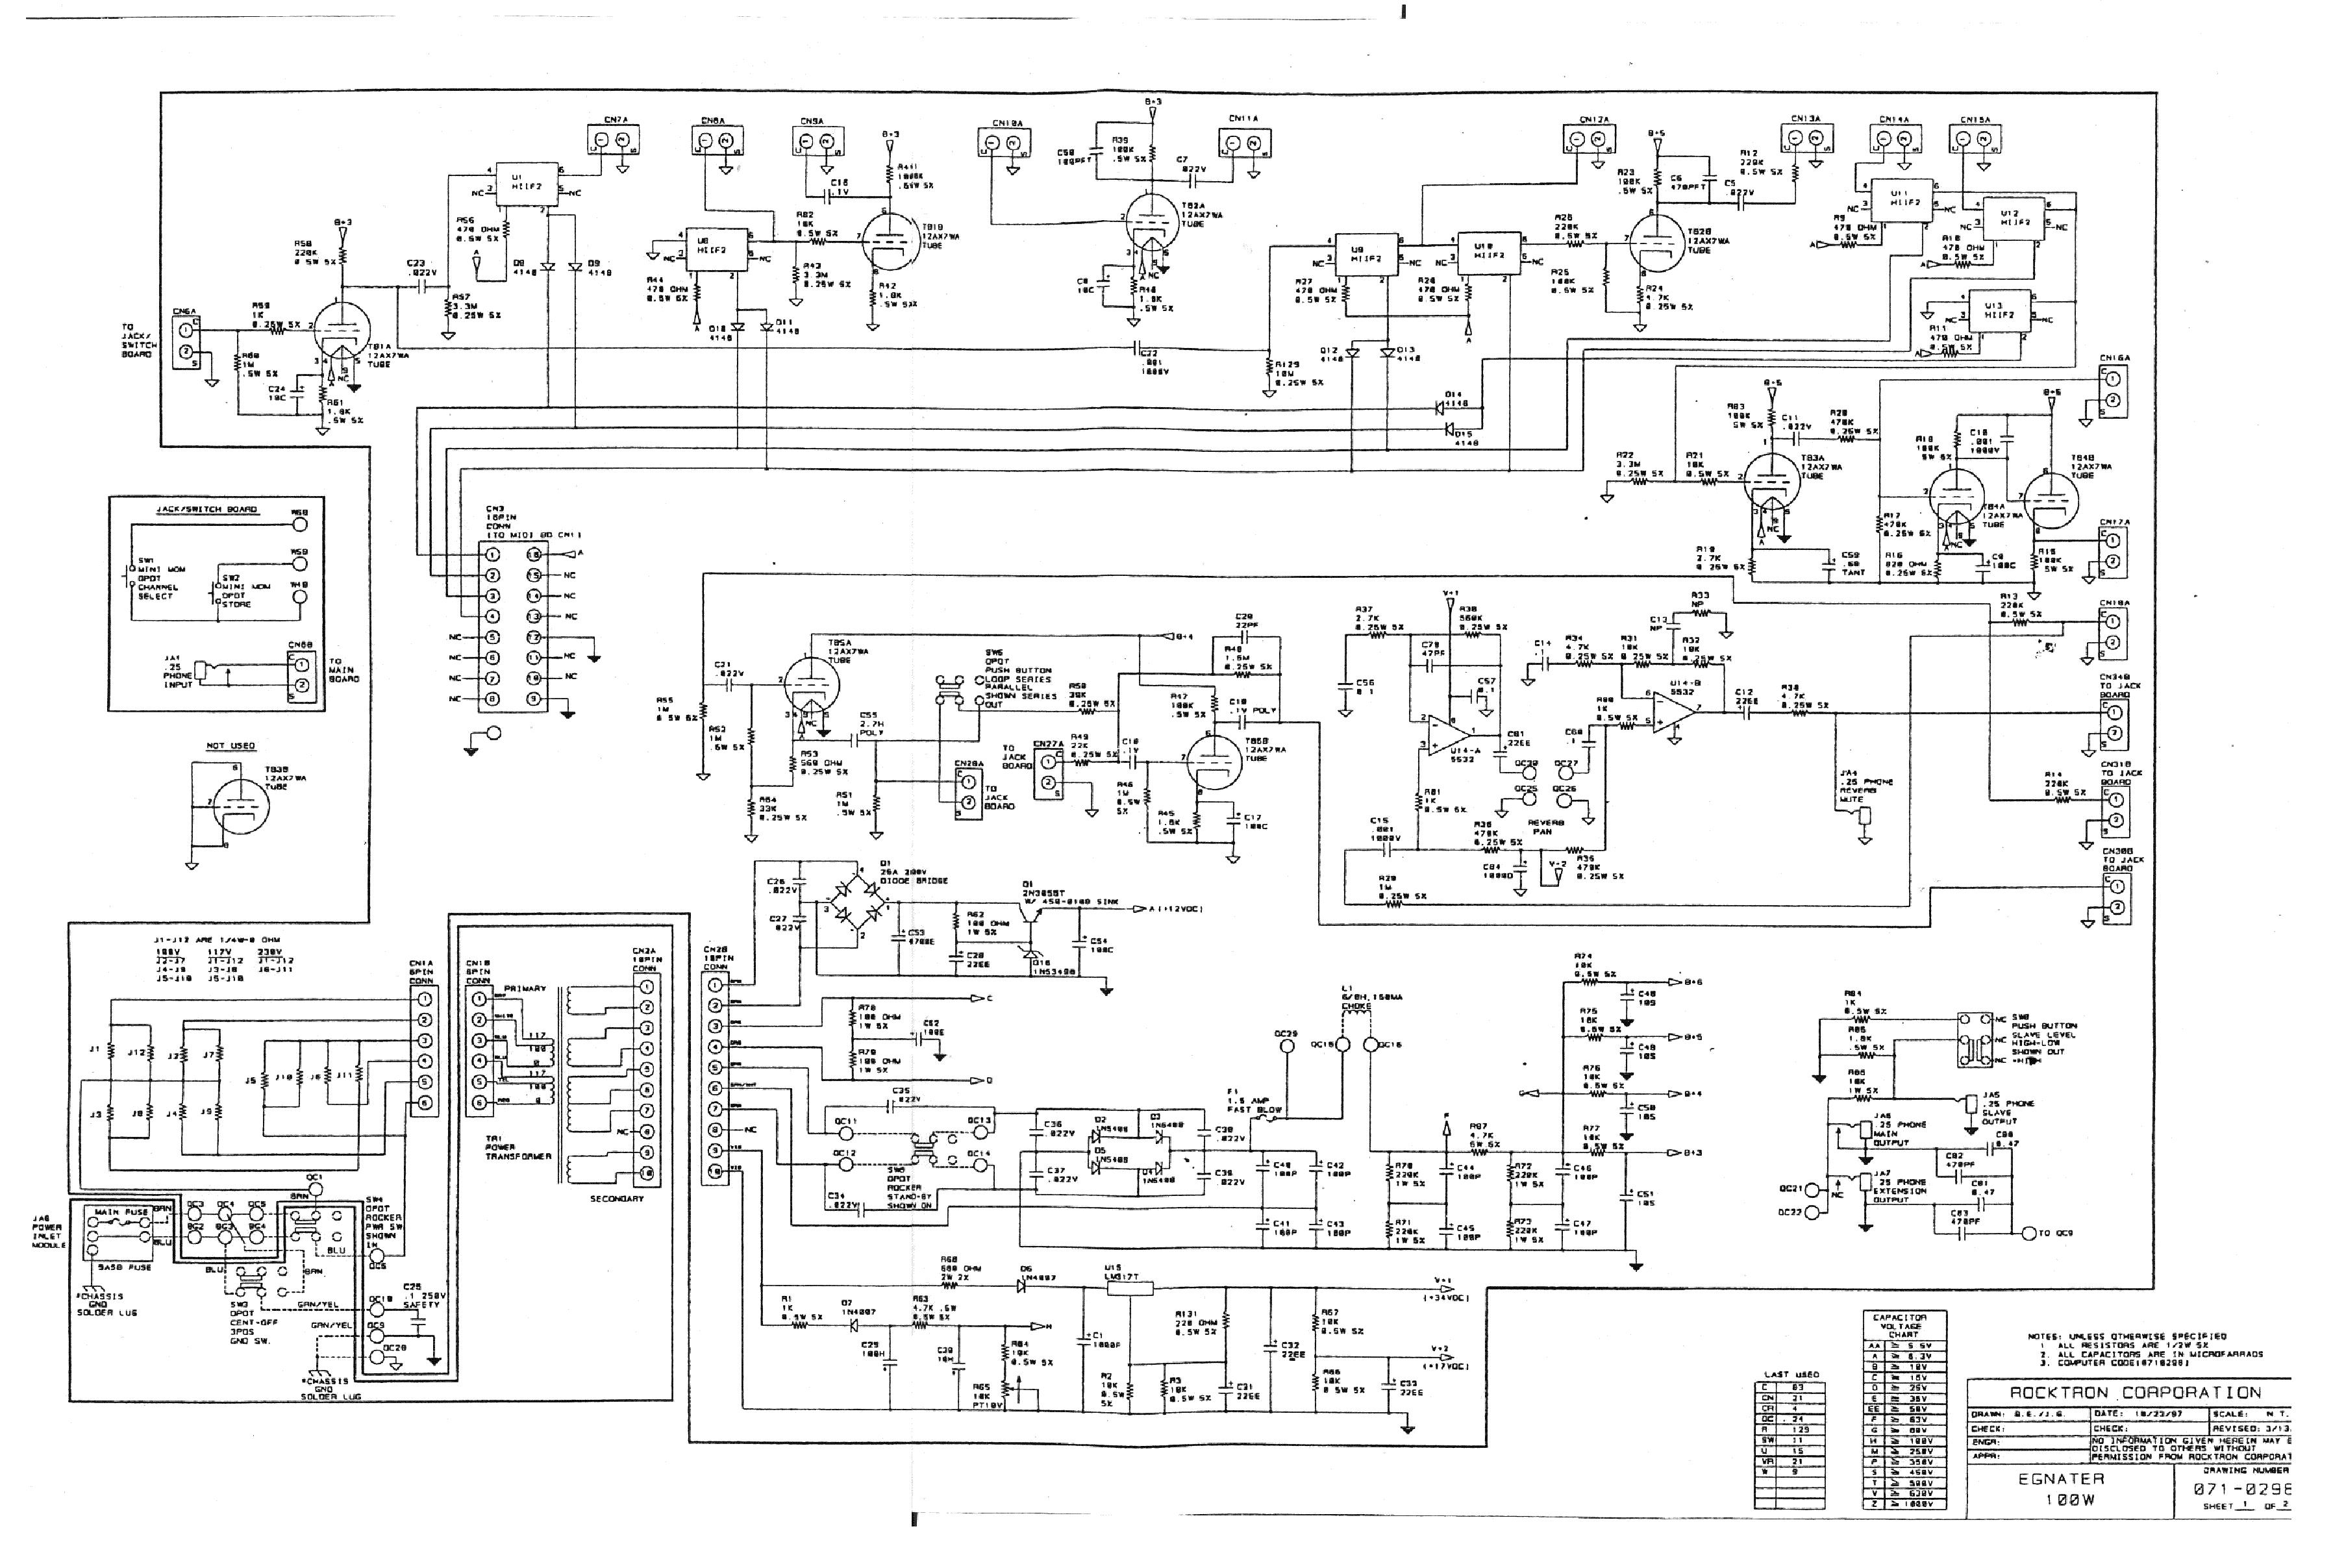 infiniti j fuse box minn kota wiring diagram  infiniti